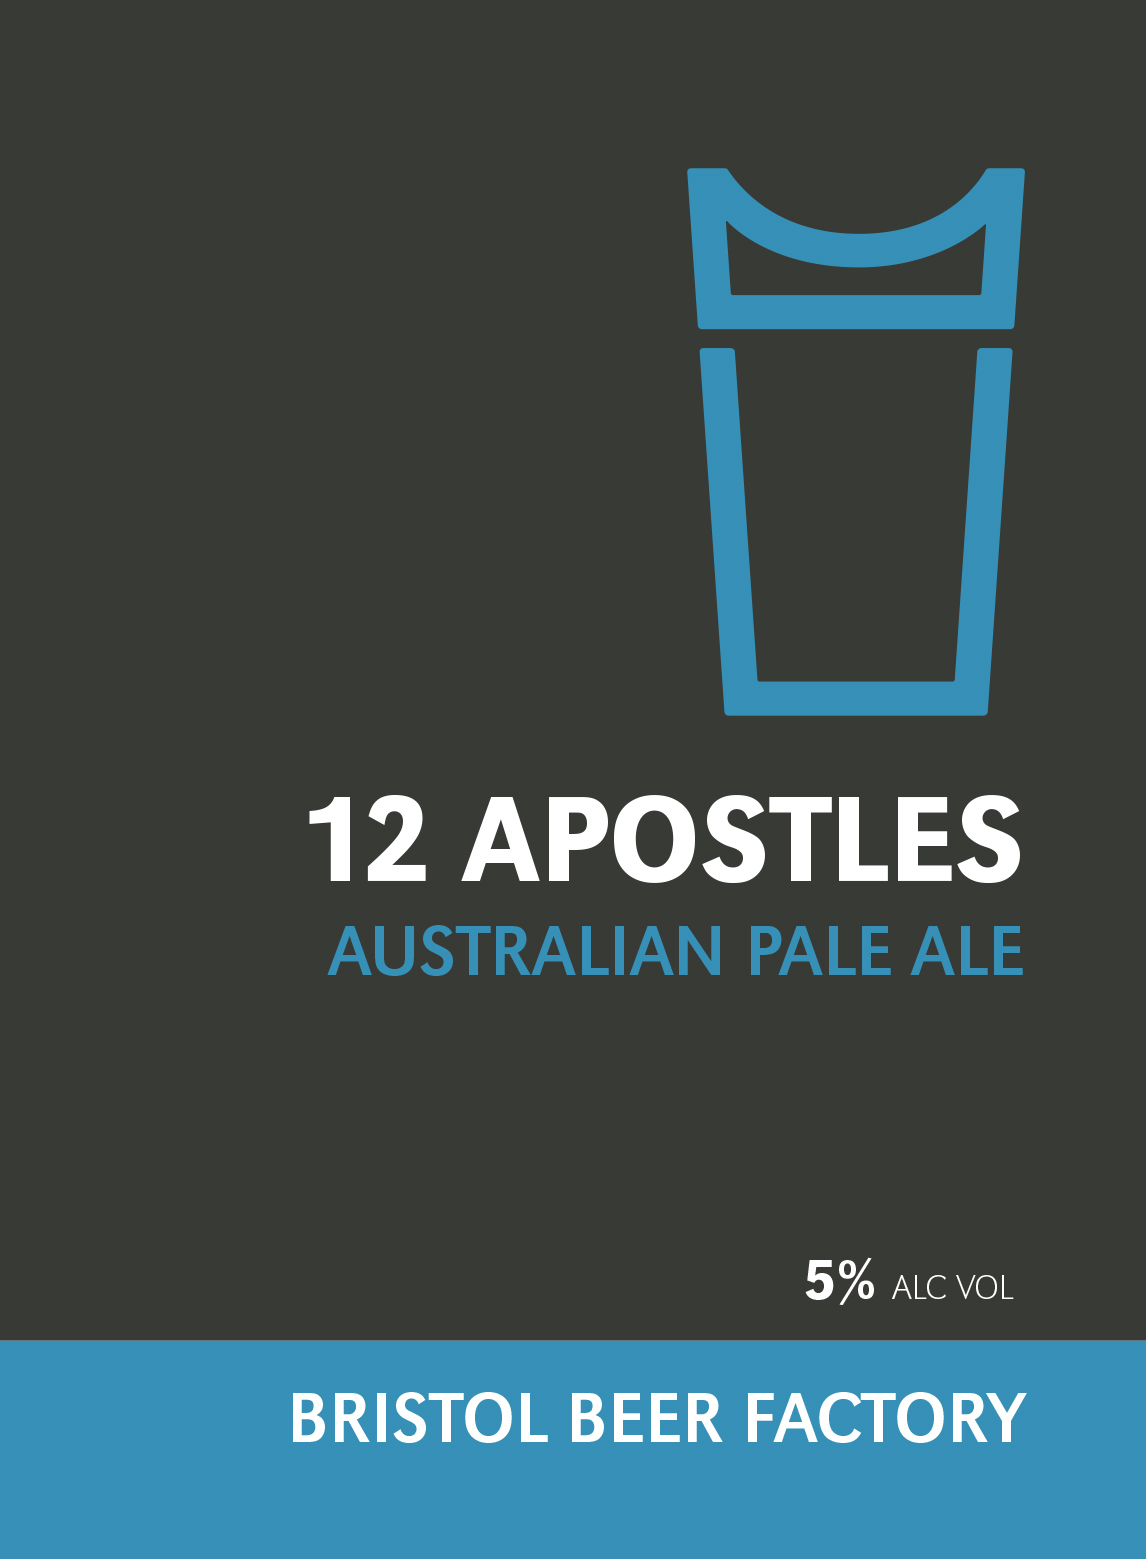 BBF 12 APOSTLES.jpg